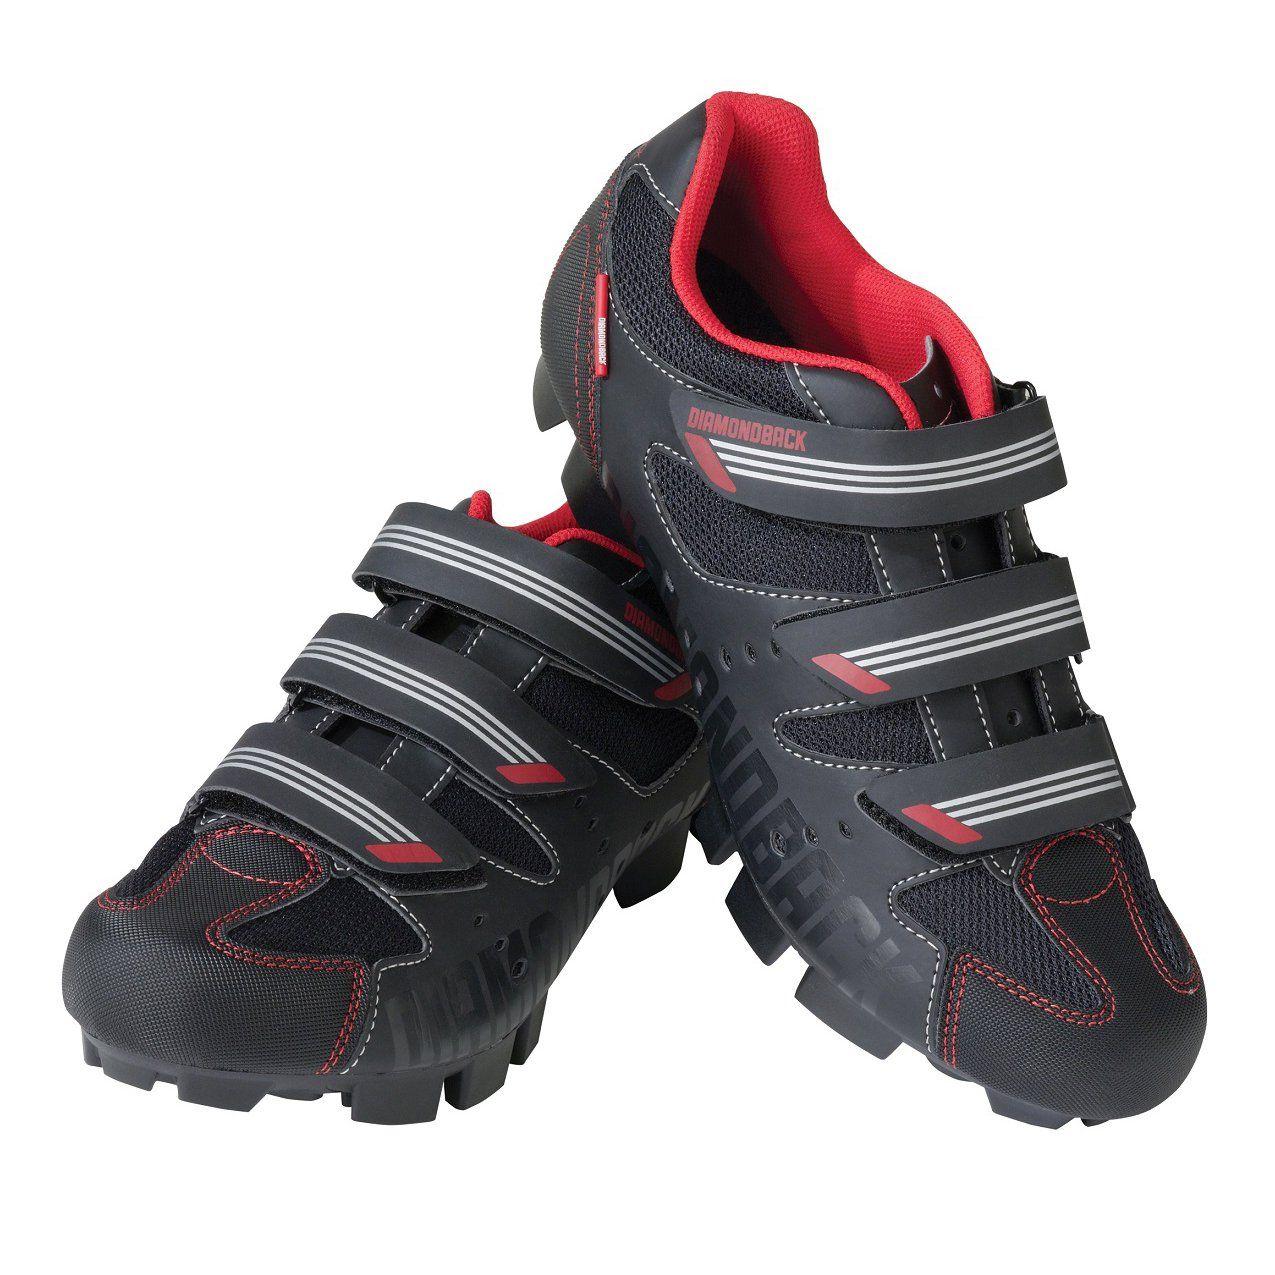 Diamondback Overdrive Mountain Cycling Shoe Ad Sponsored